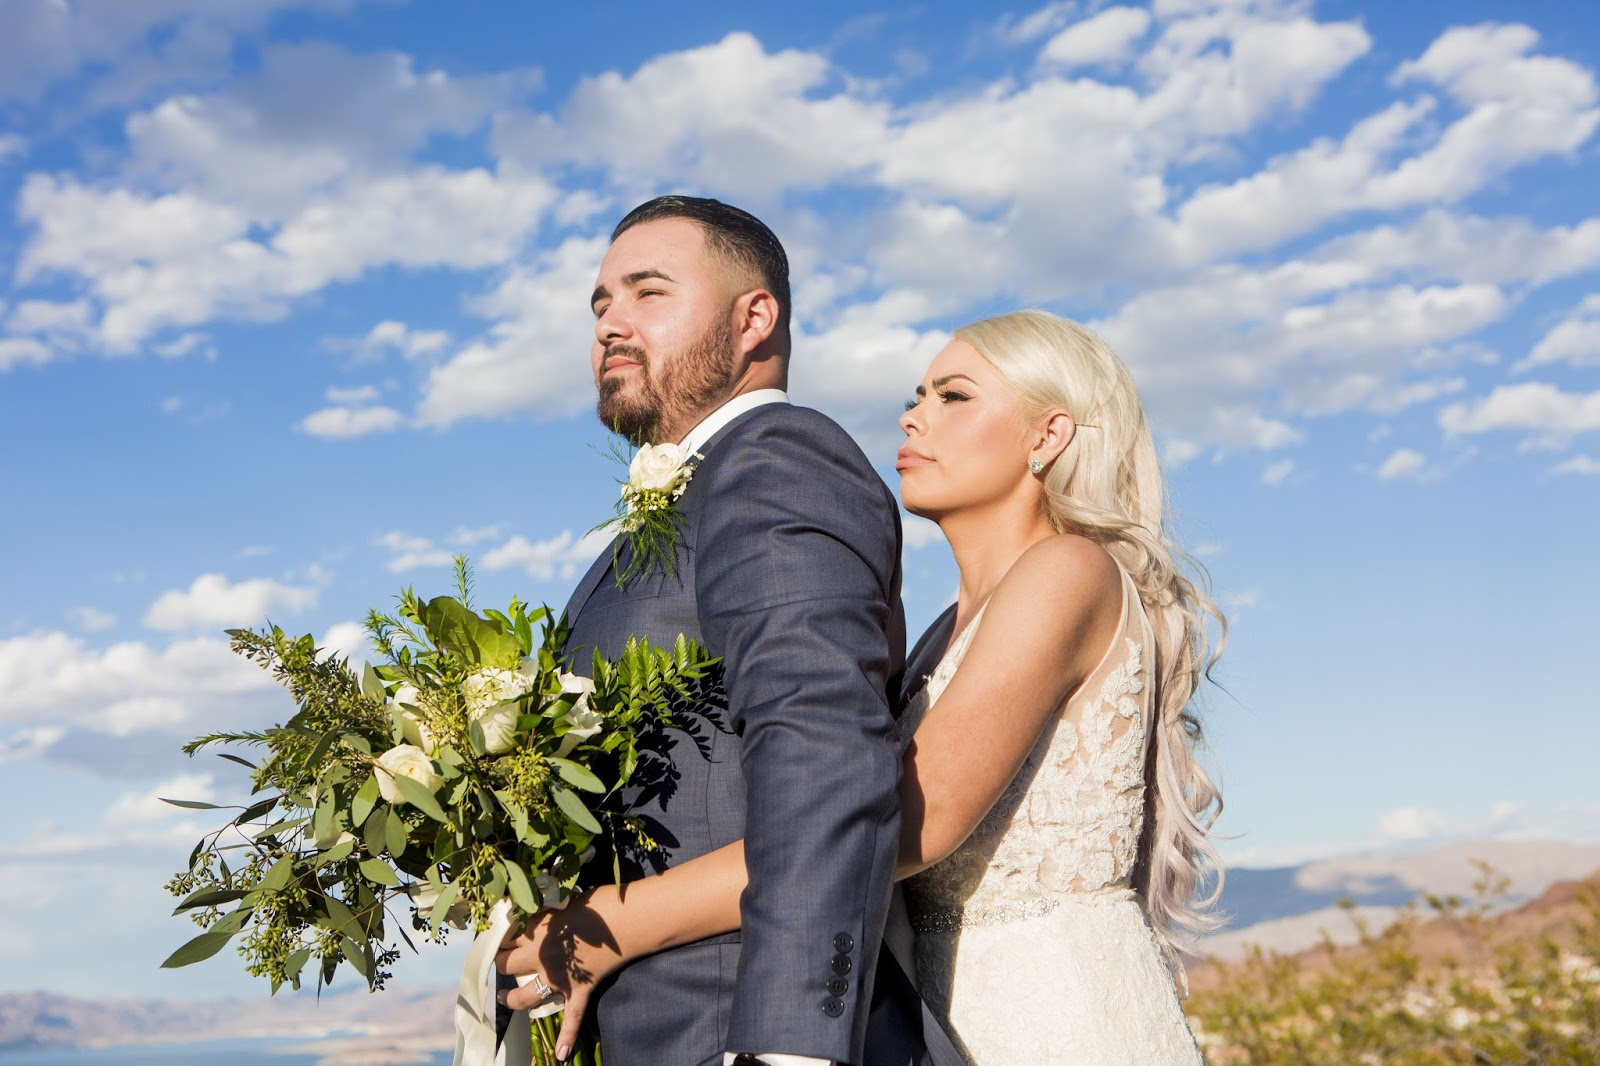 Michelle and carlos wedding